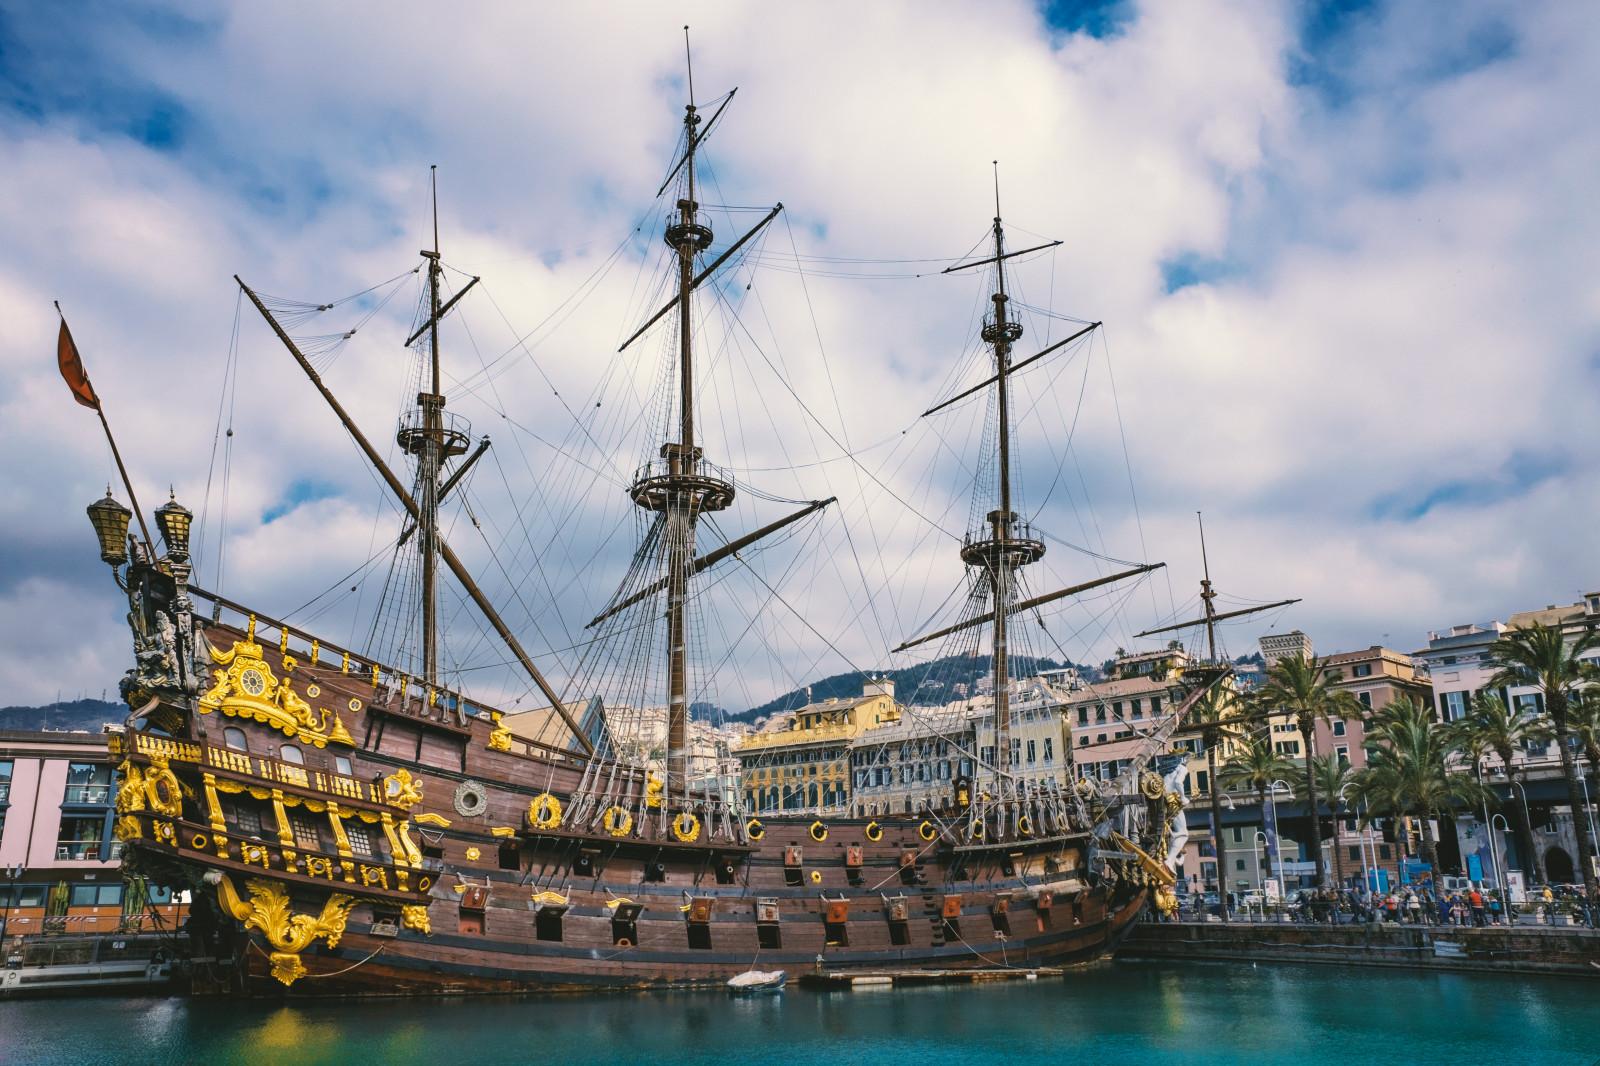 Fond d 39 cran gens bateau voile mer italie ciel - Voile bateau pirate ...